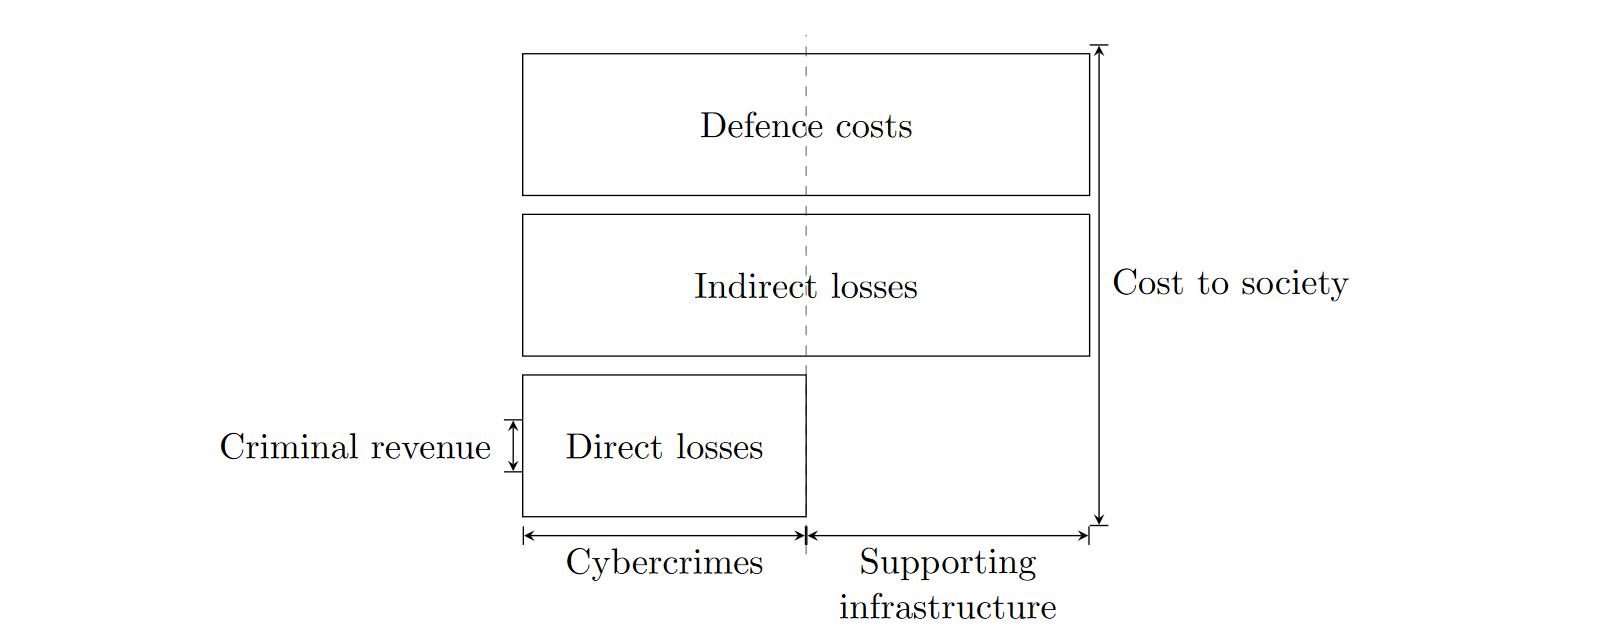 Cost of Cybercrime framework